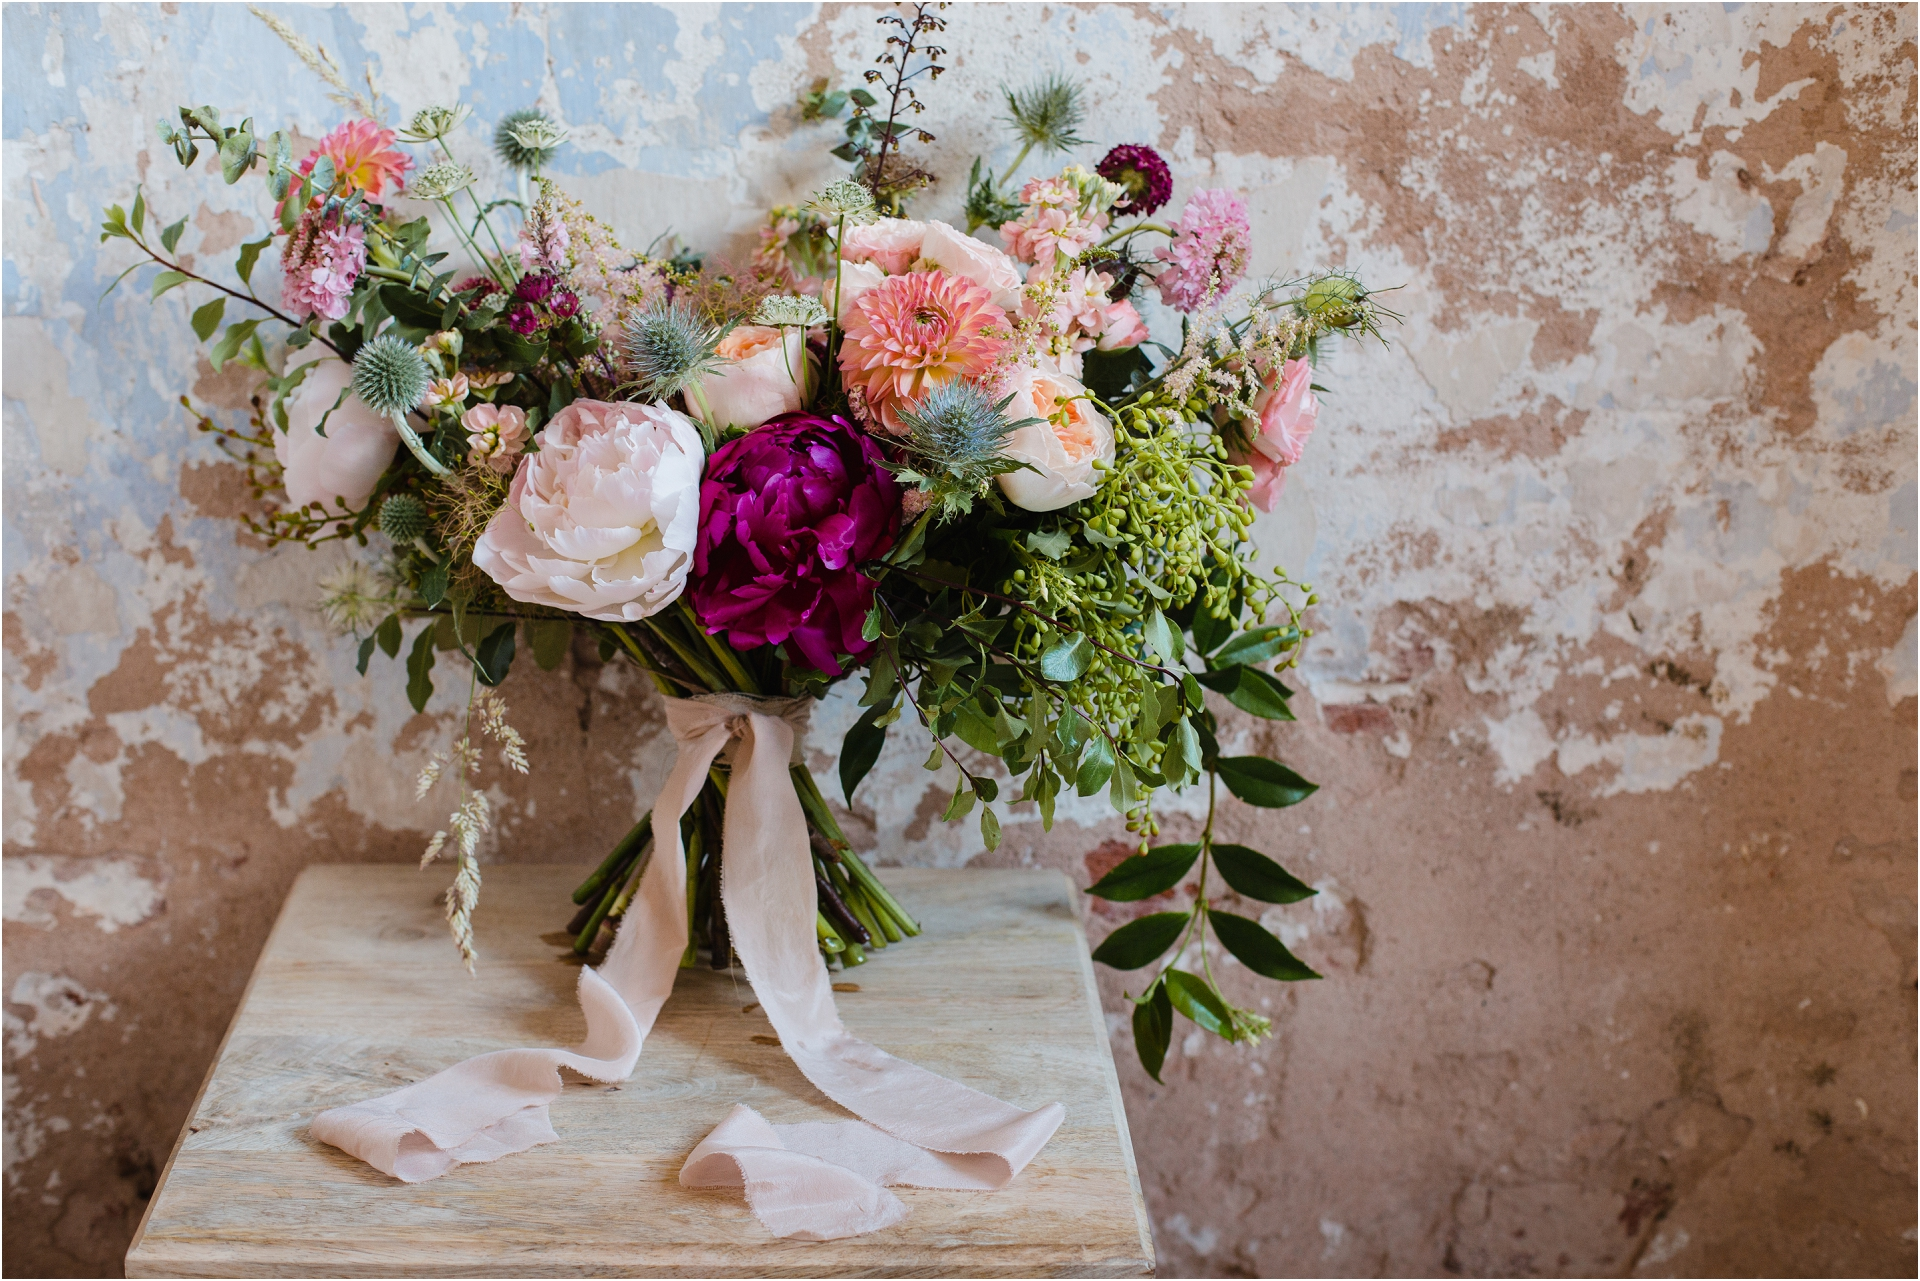 Hand gathered summer wedding flowers